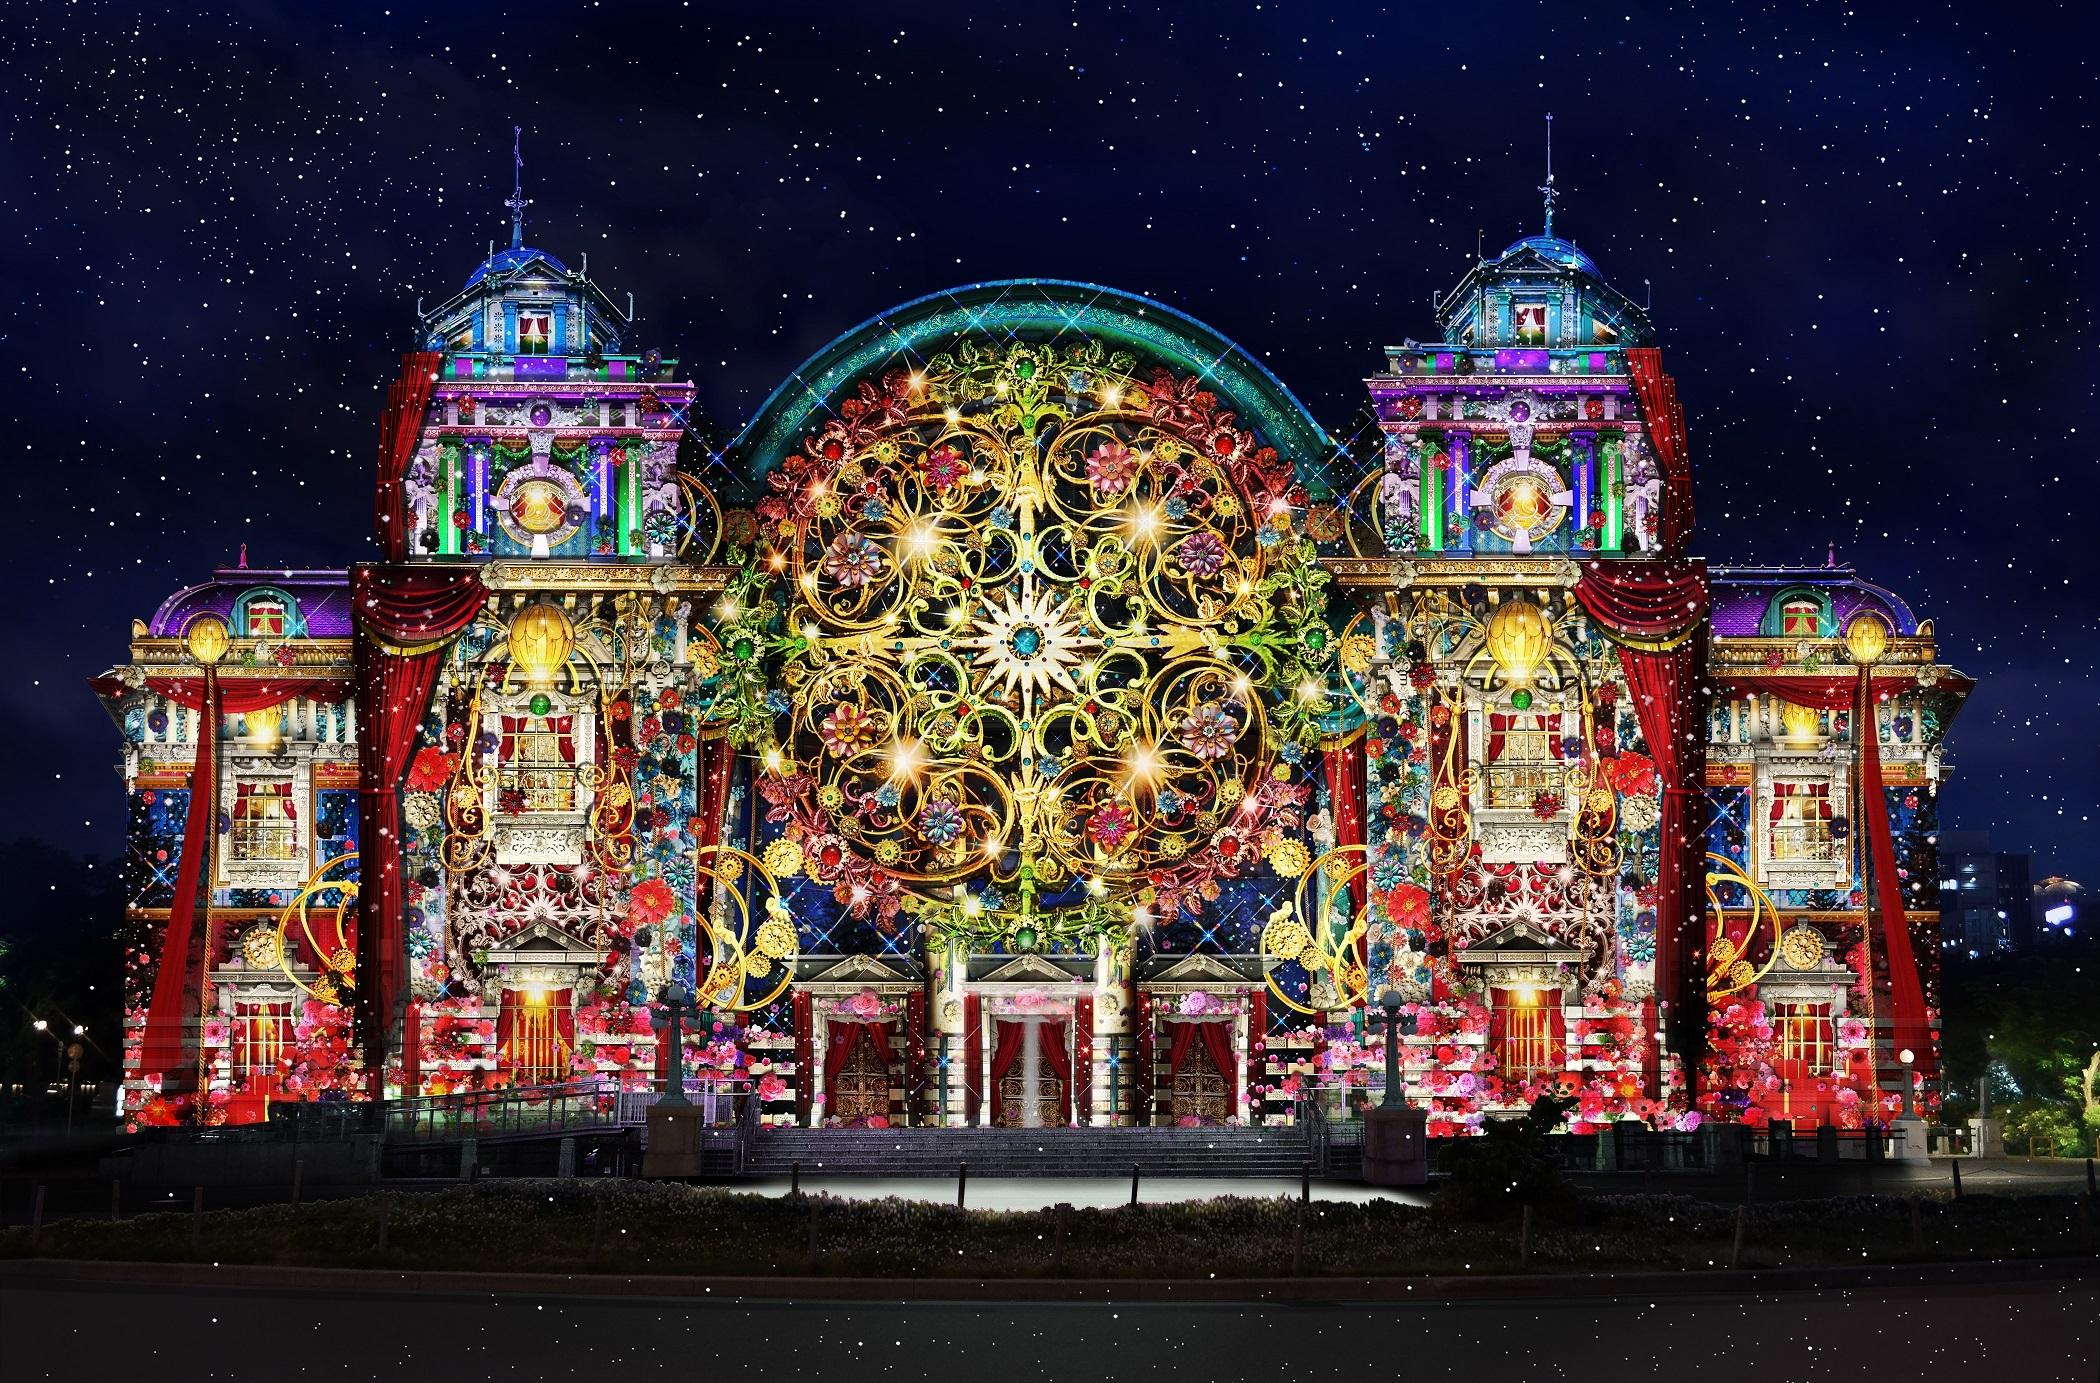 OSAKA光のルネサンス2019 (※画像はイメージ) (C)大阪・光の饗宴実行委員会